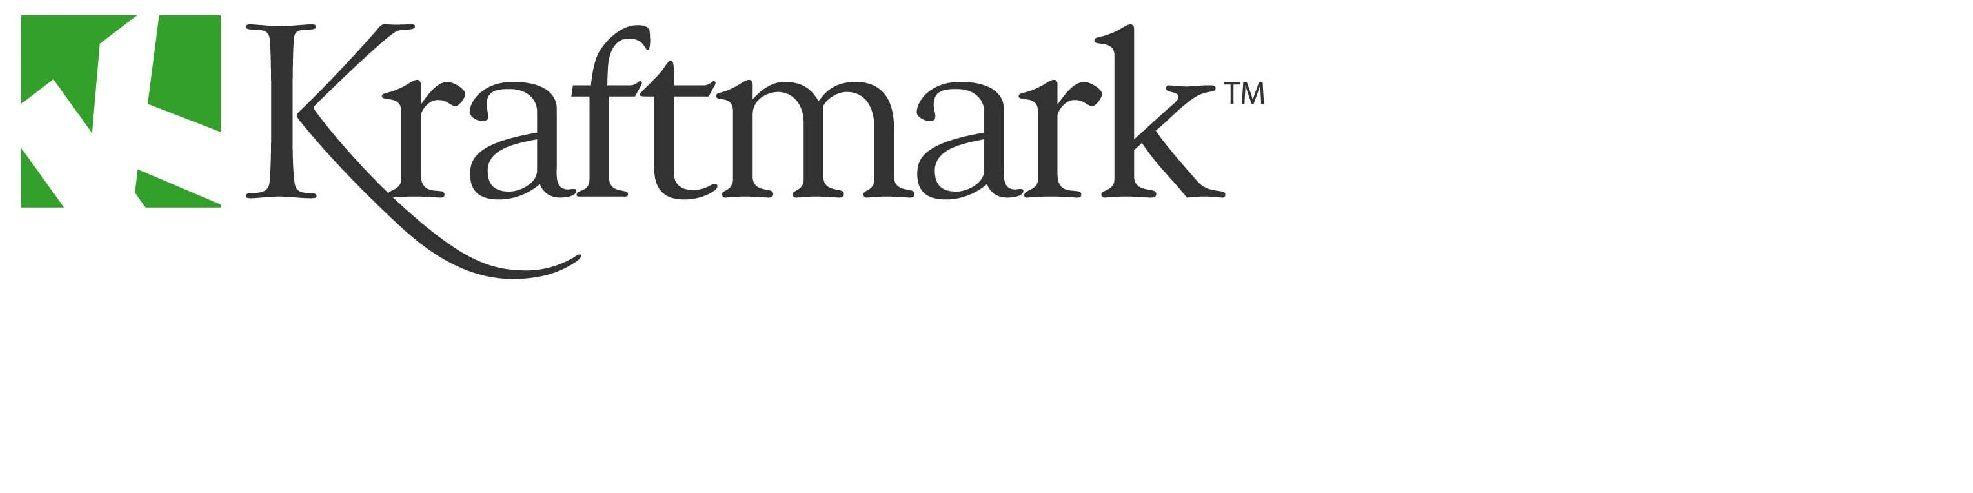 kraftmark-logo